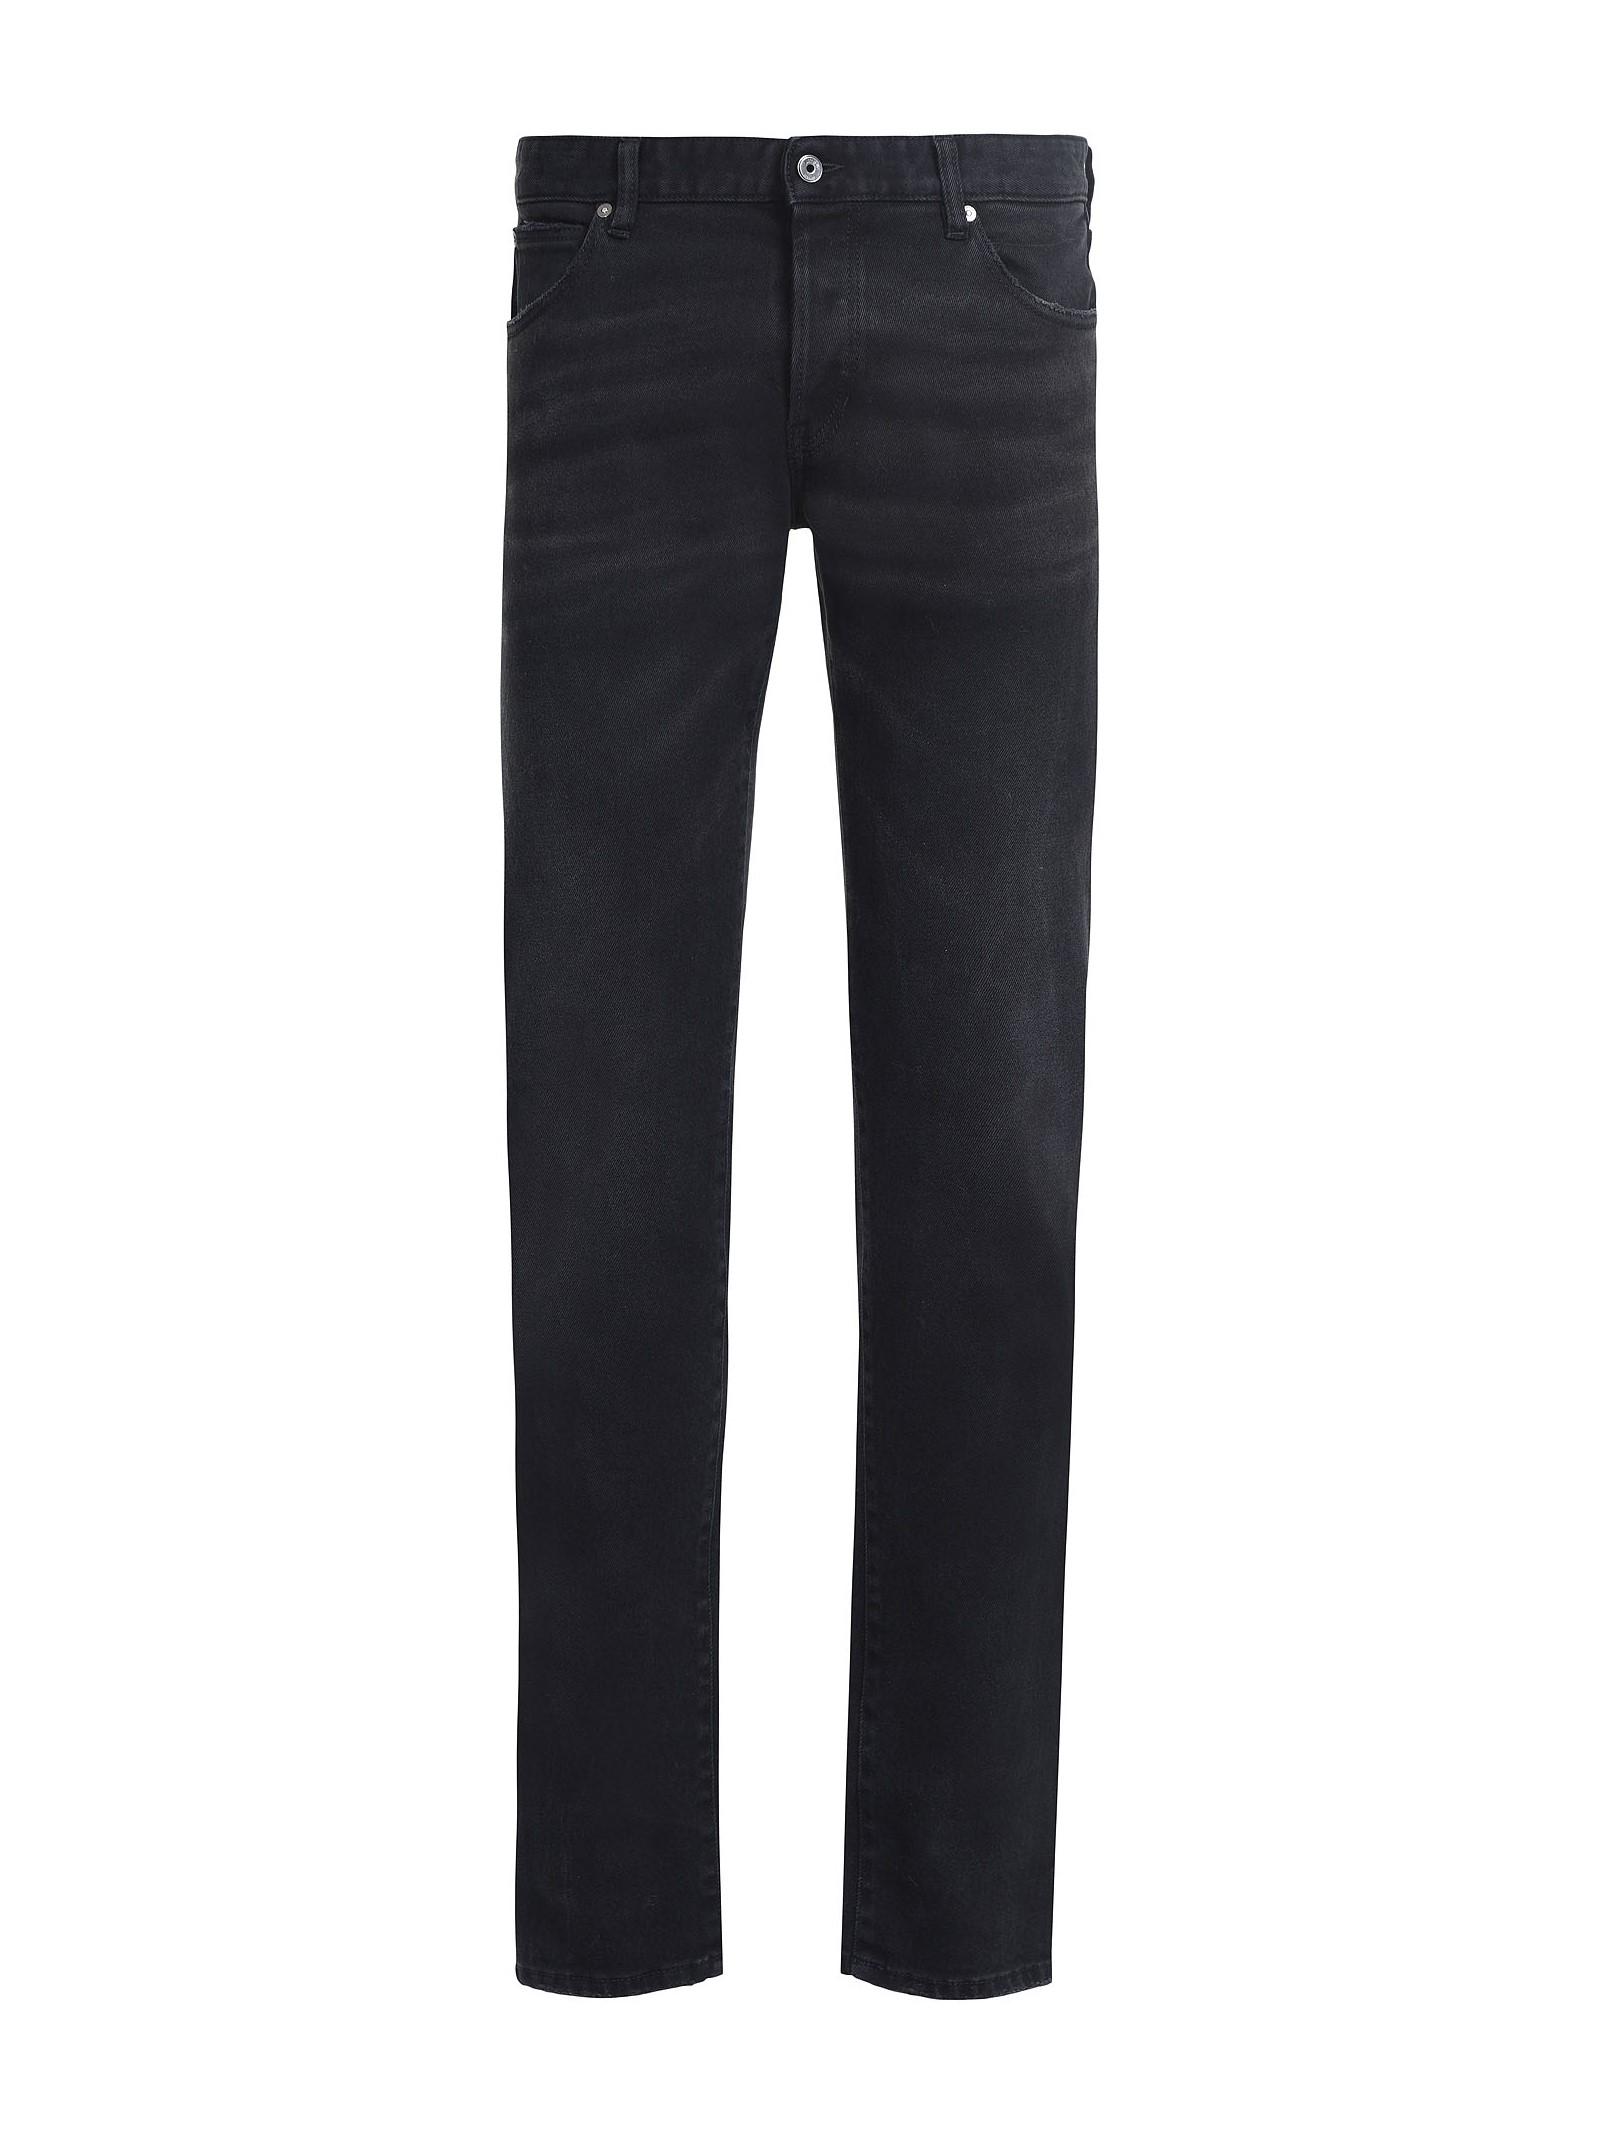 Pantaloni sportivi con stampa Just Cavalli   Jeans   S03LA0133-N31959900